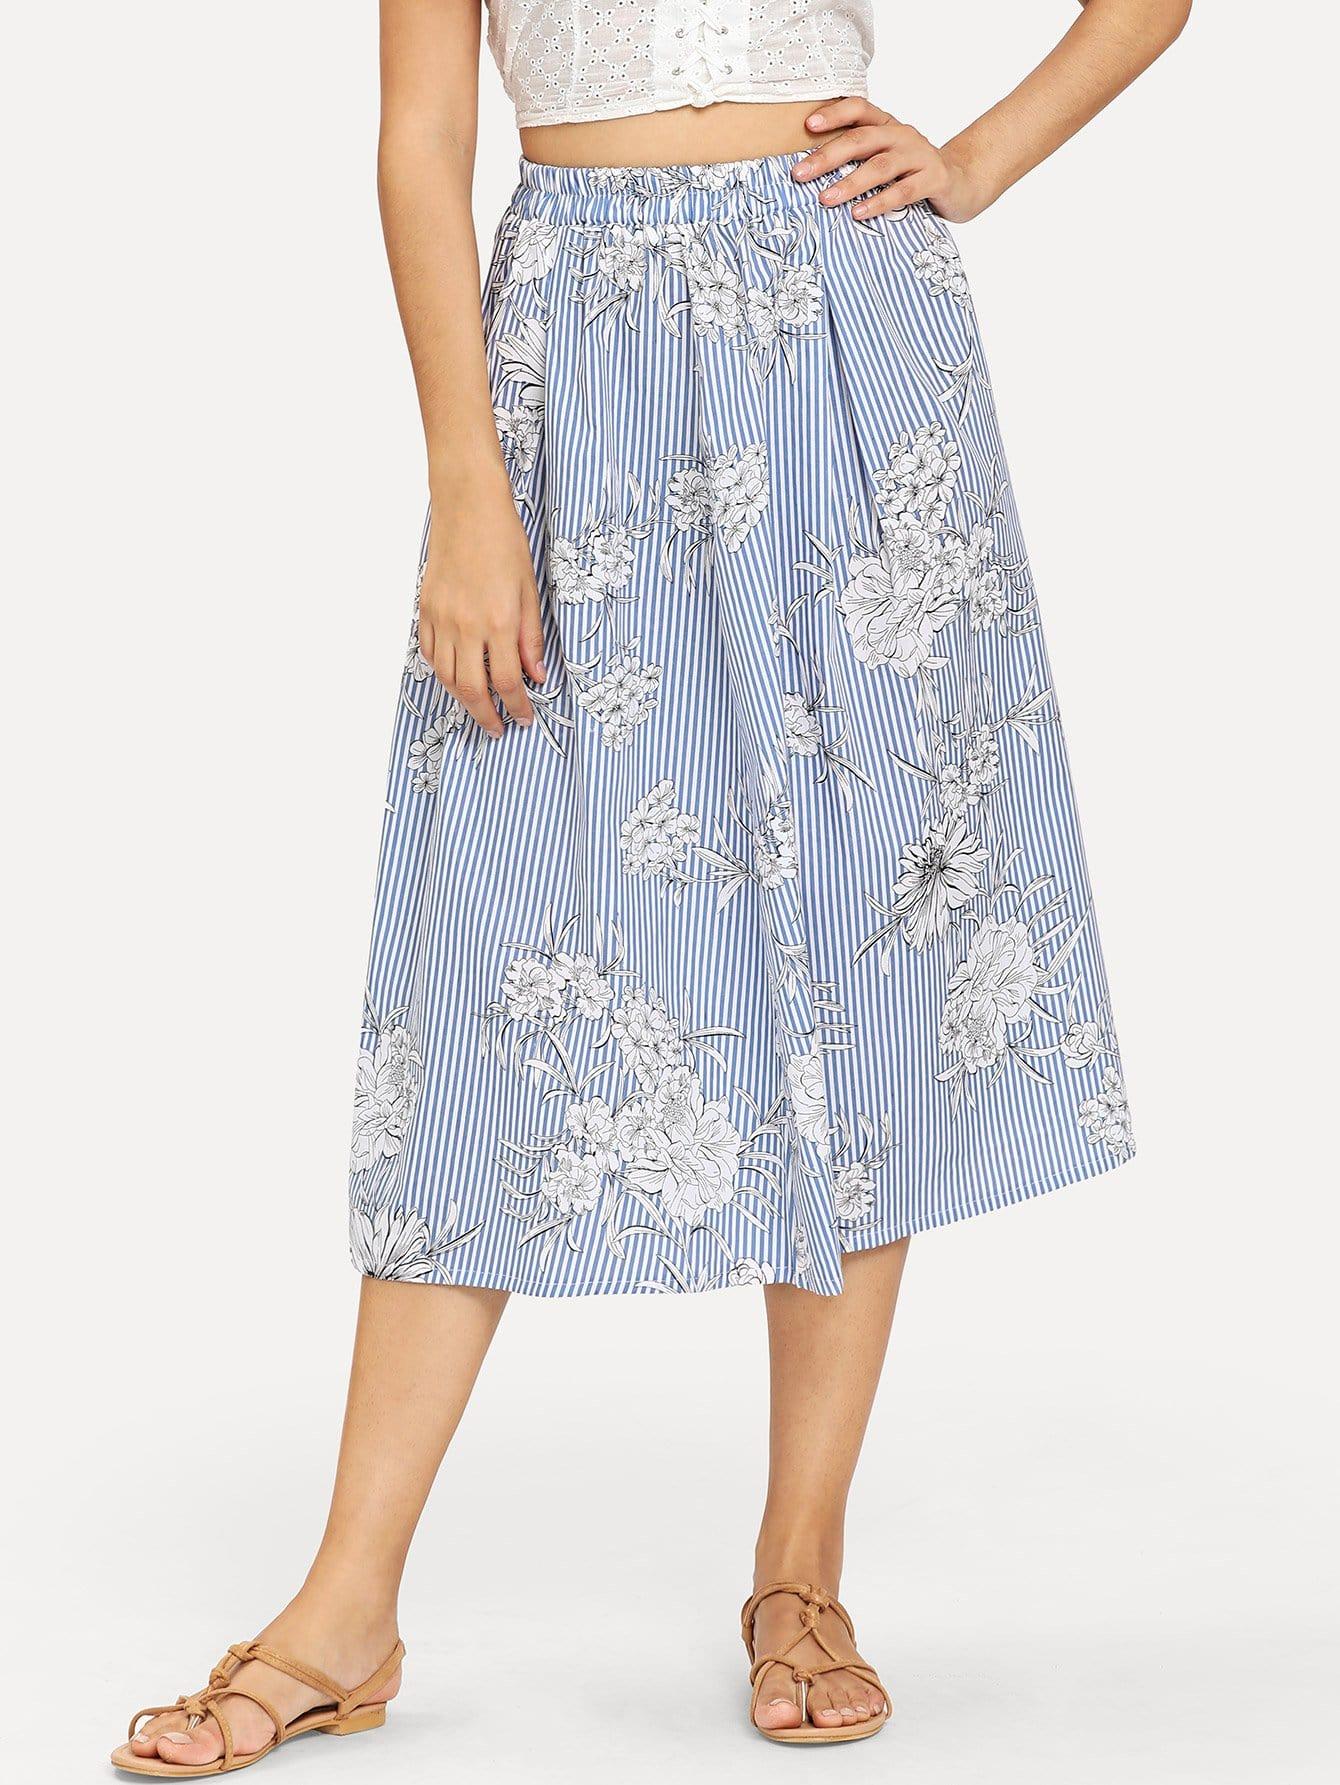 Floral Print Striped Skirt